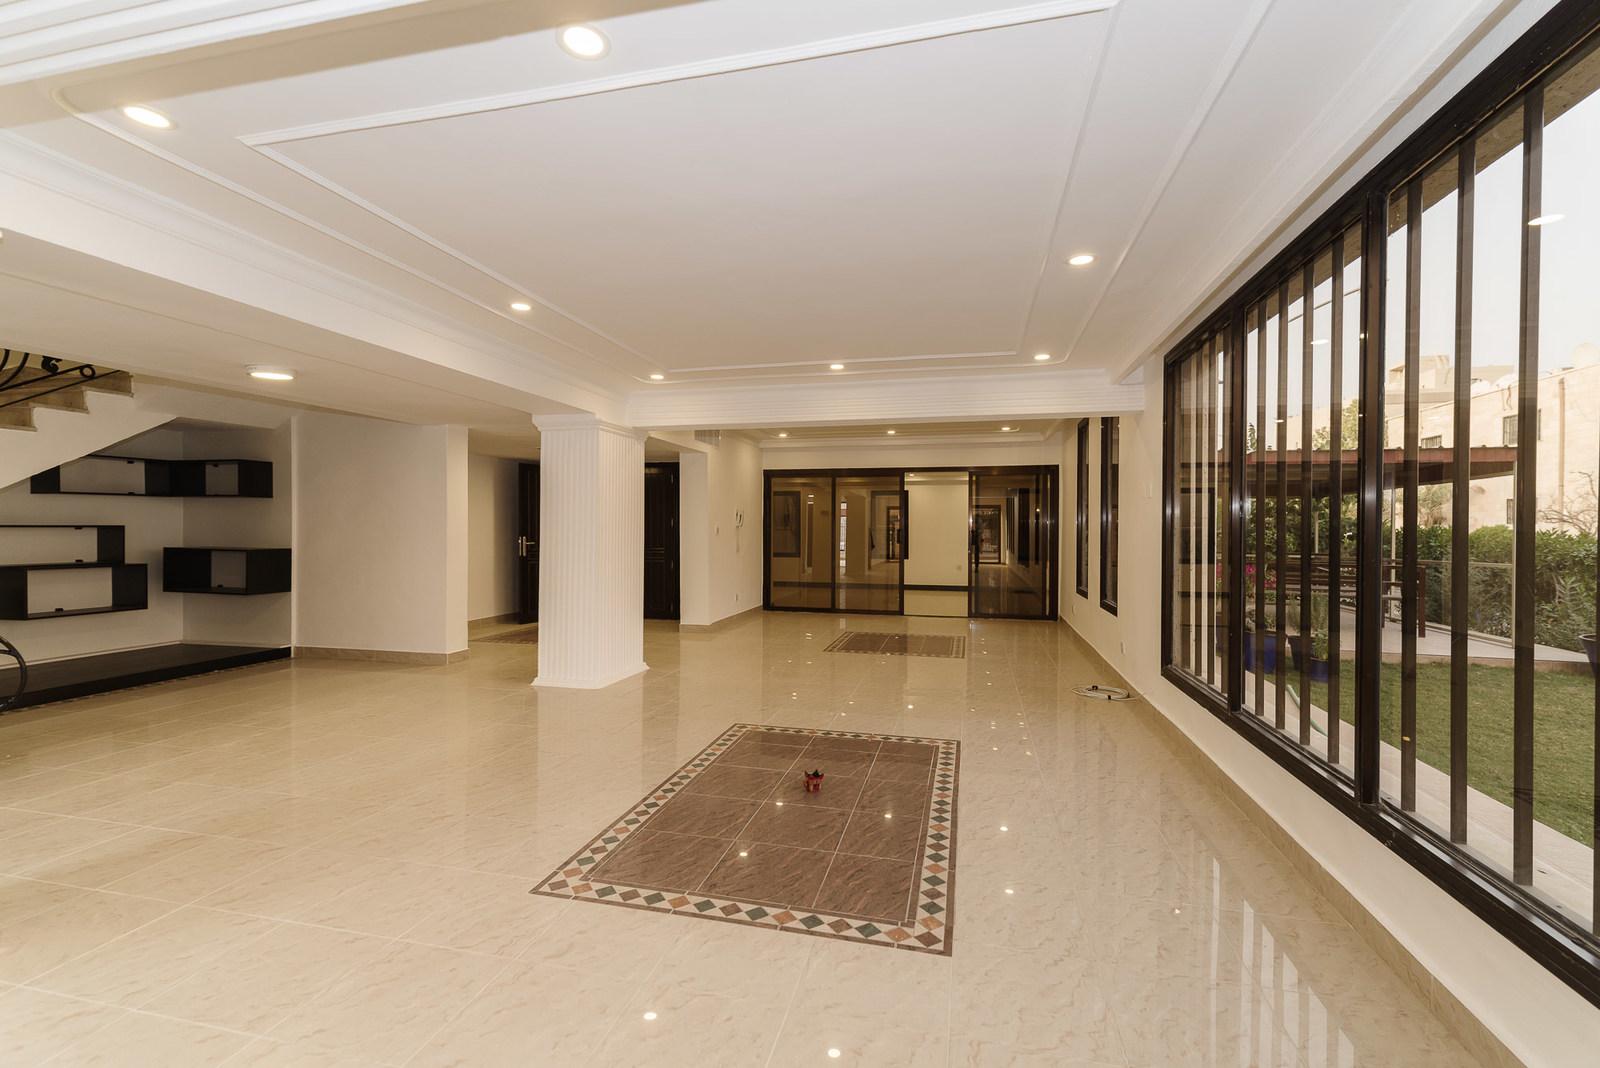 Kheitan – great, unfurnished, fully renovated, five bedroom villa w/garden